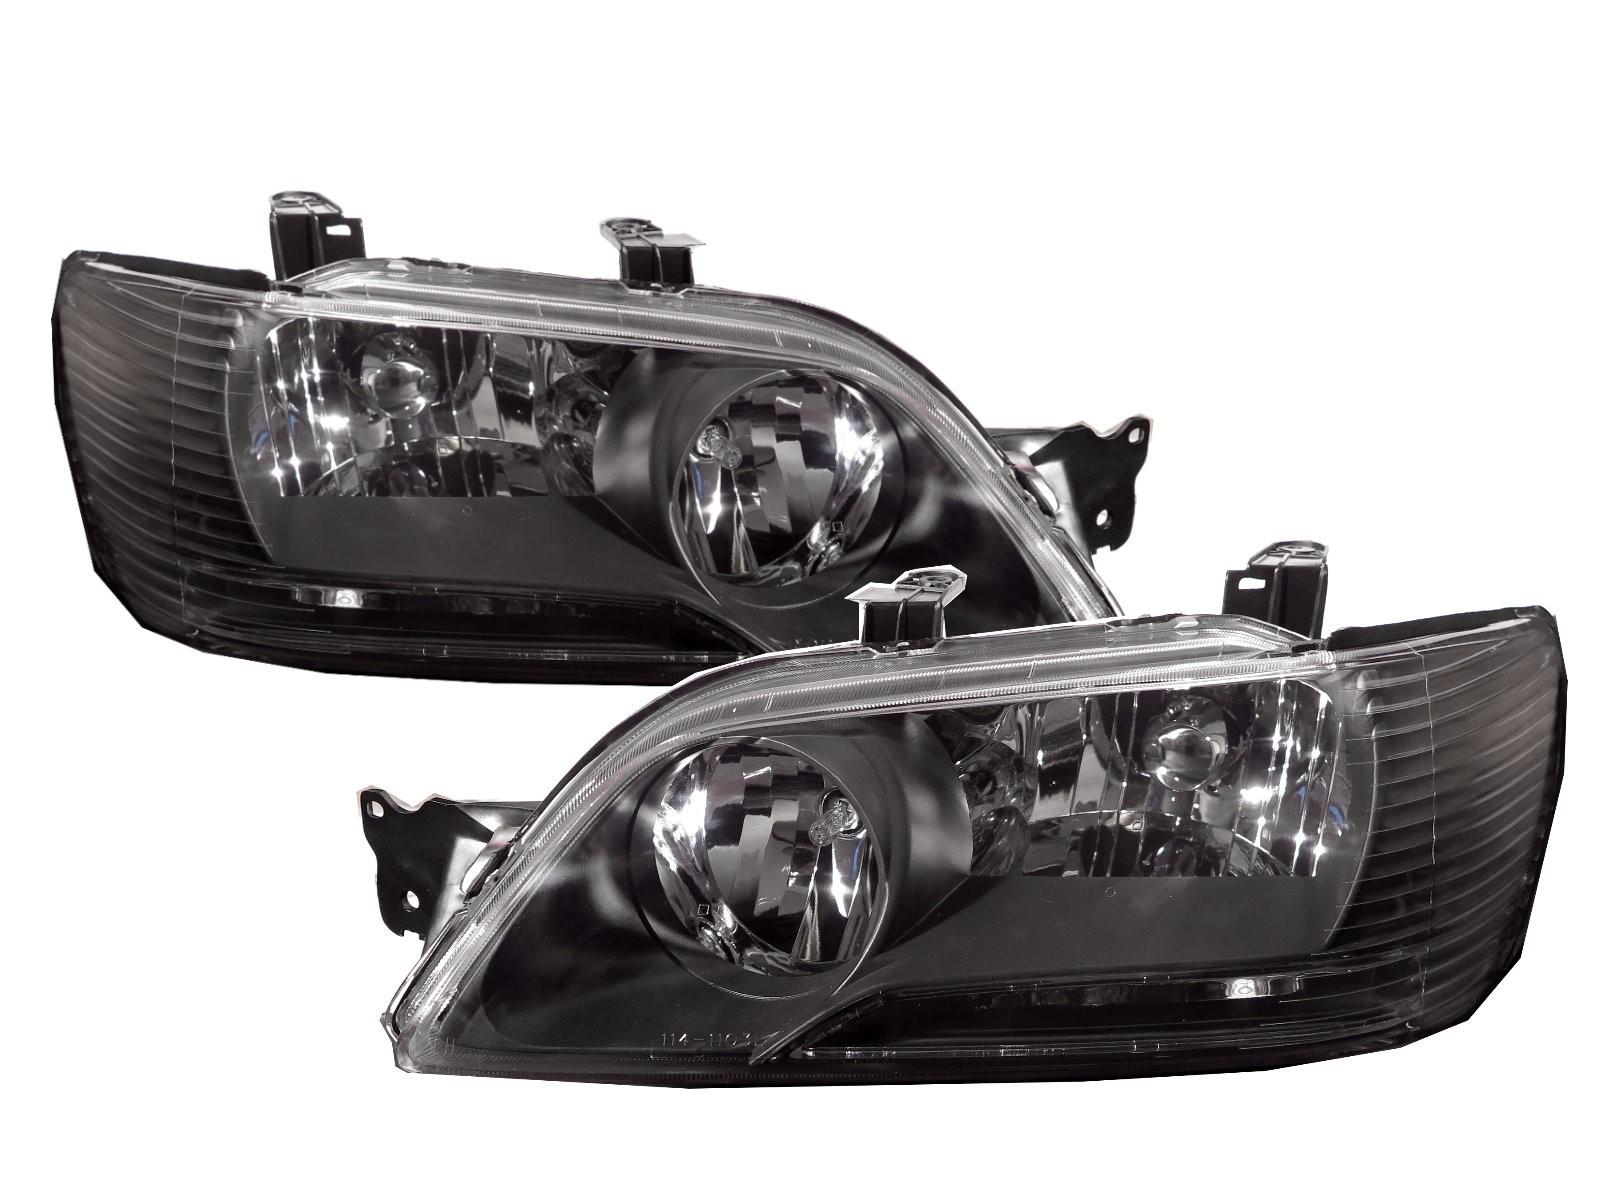 CrazyTheGod LANCER CEDIA/CG 2001-2003 Sedan/Wagon 4D/5D Clear Headlight Headlamp Black US for Mitsubishi LHD